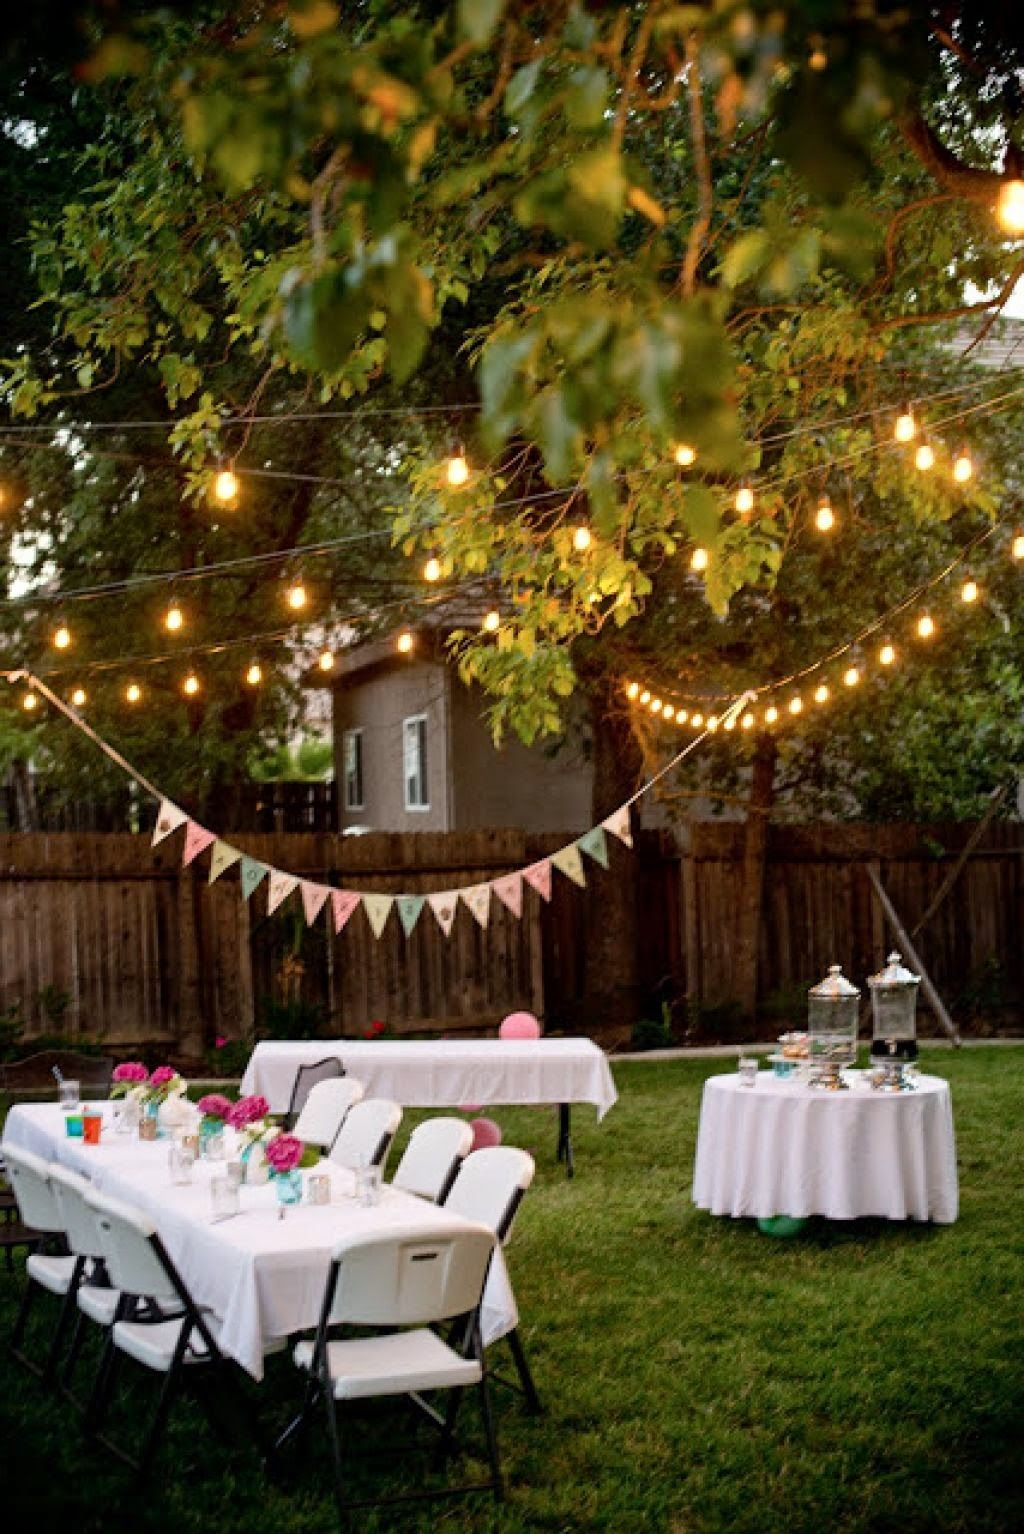 Backyard Party Decorating Gartenparty Deko Party Dekoration Selbst Basteln Partybeleuchtung